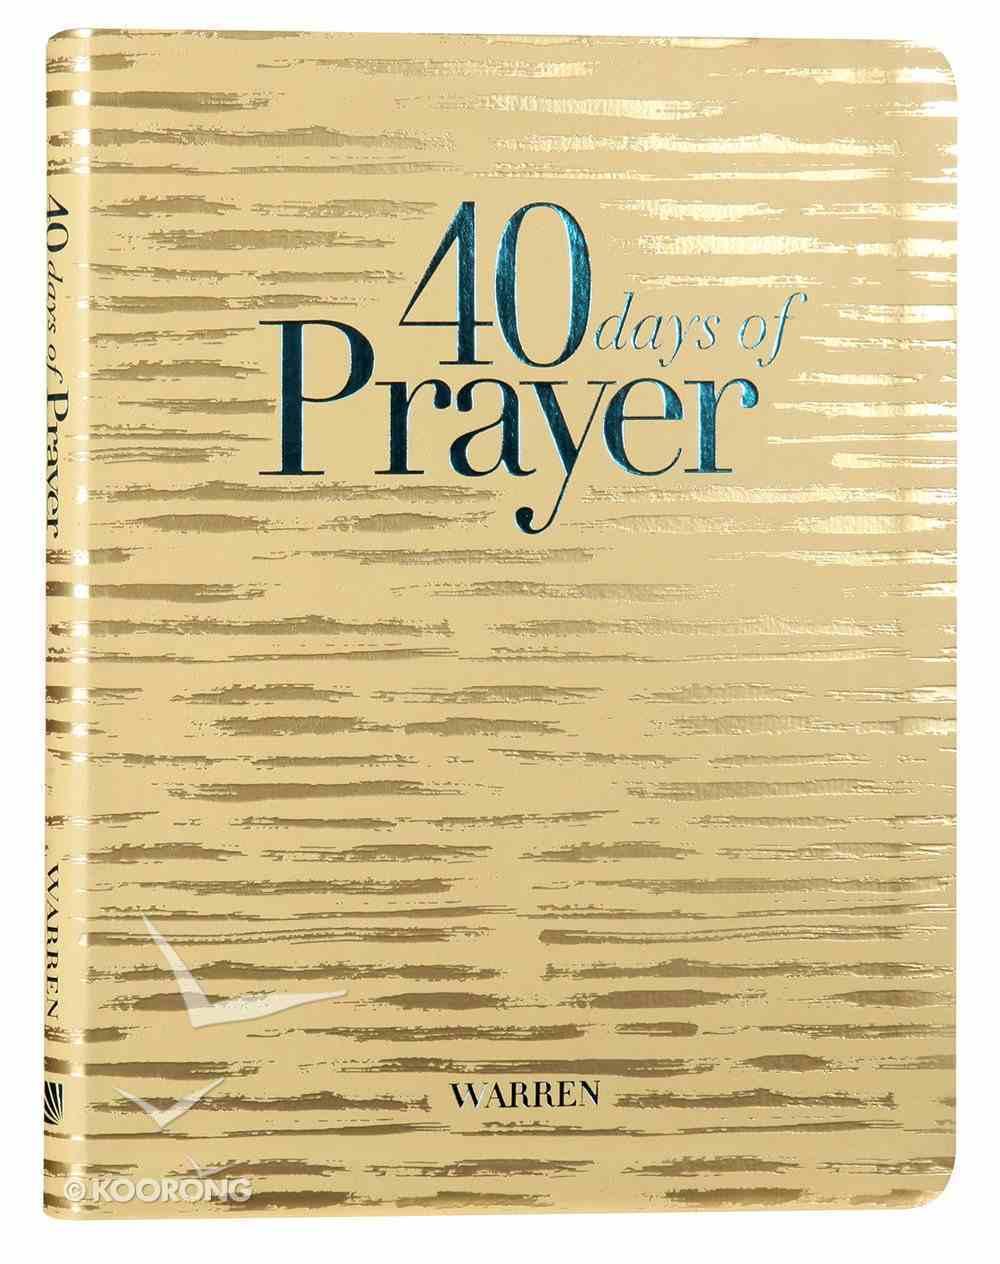 40 Days of Prayer (Workbook) Paperback